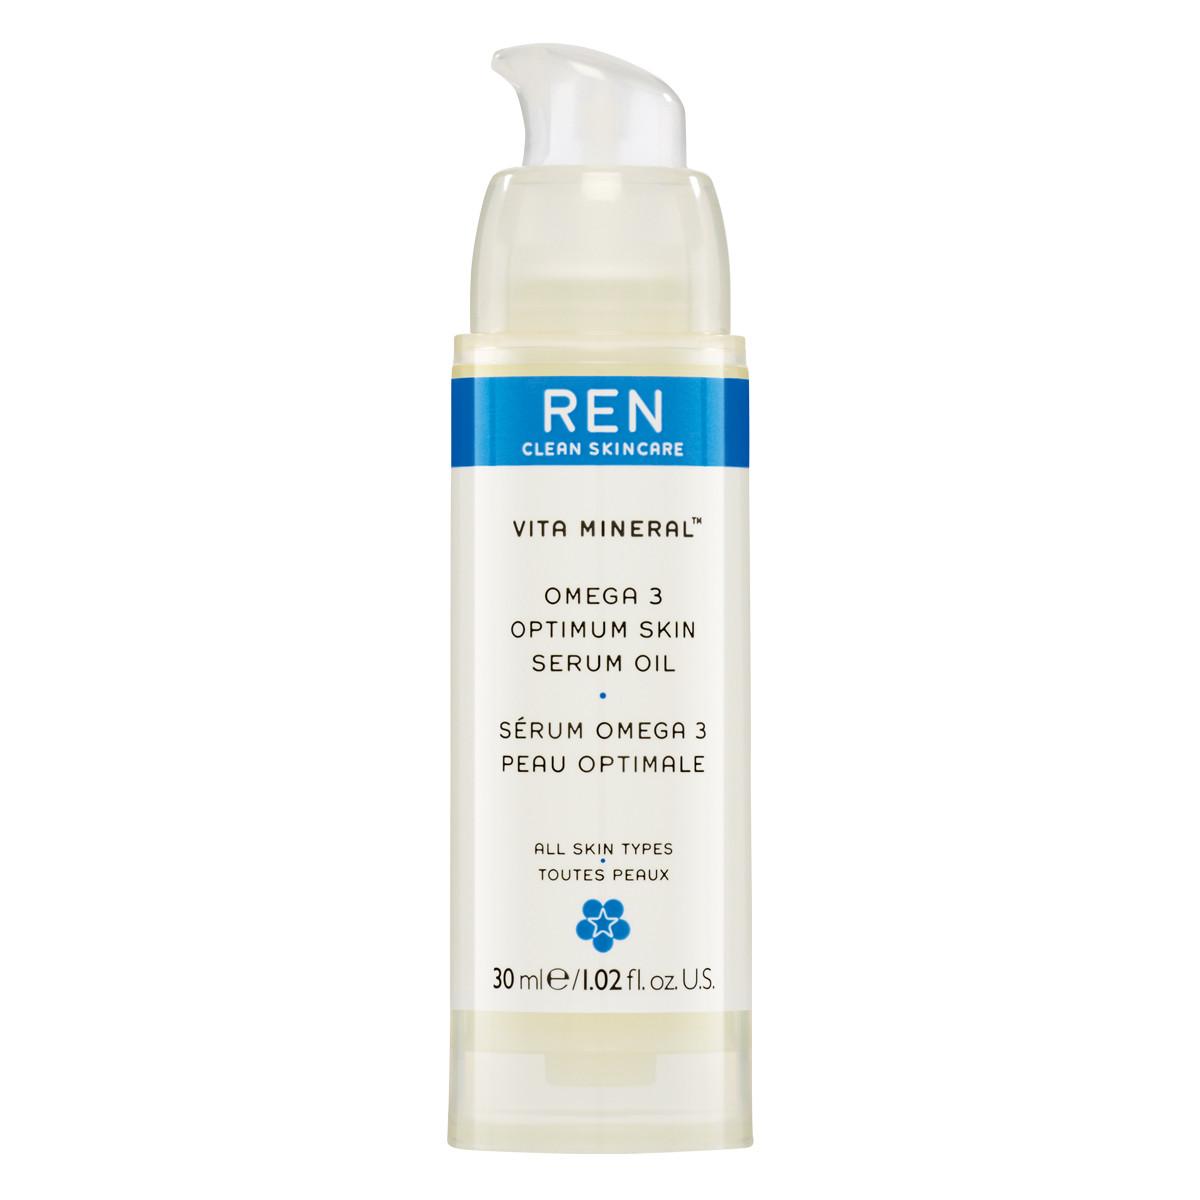 ren-clean-skincare-vita-mineral-omega3-optimum-skin-oil-gesichtsoel